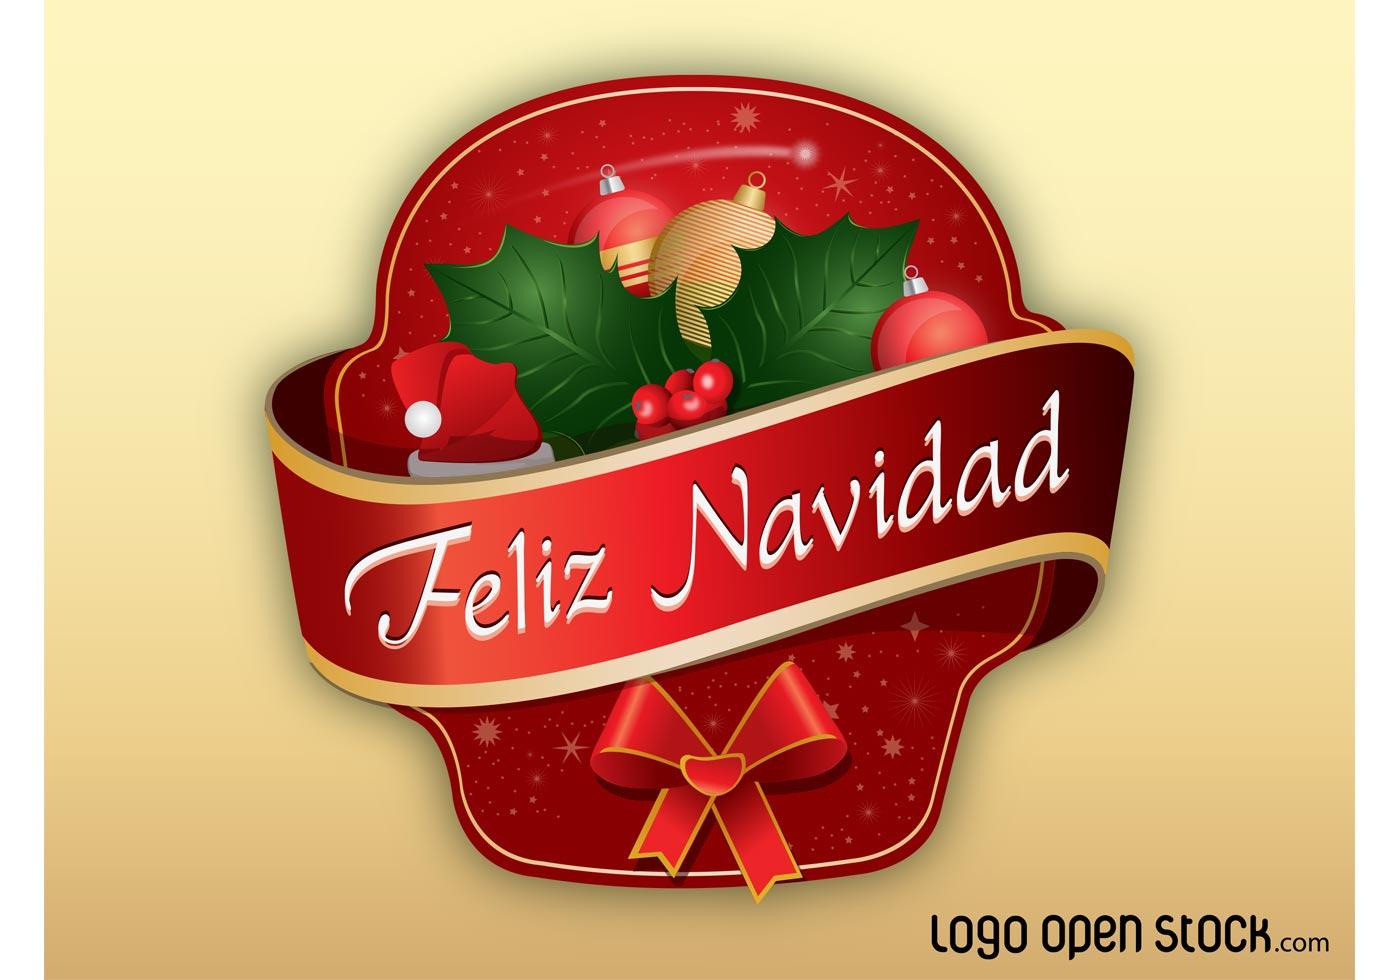 Feliz navidad download free vector art stock graphics images - Sobre de navidad para imprimir ...